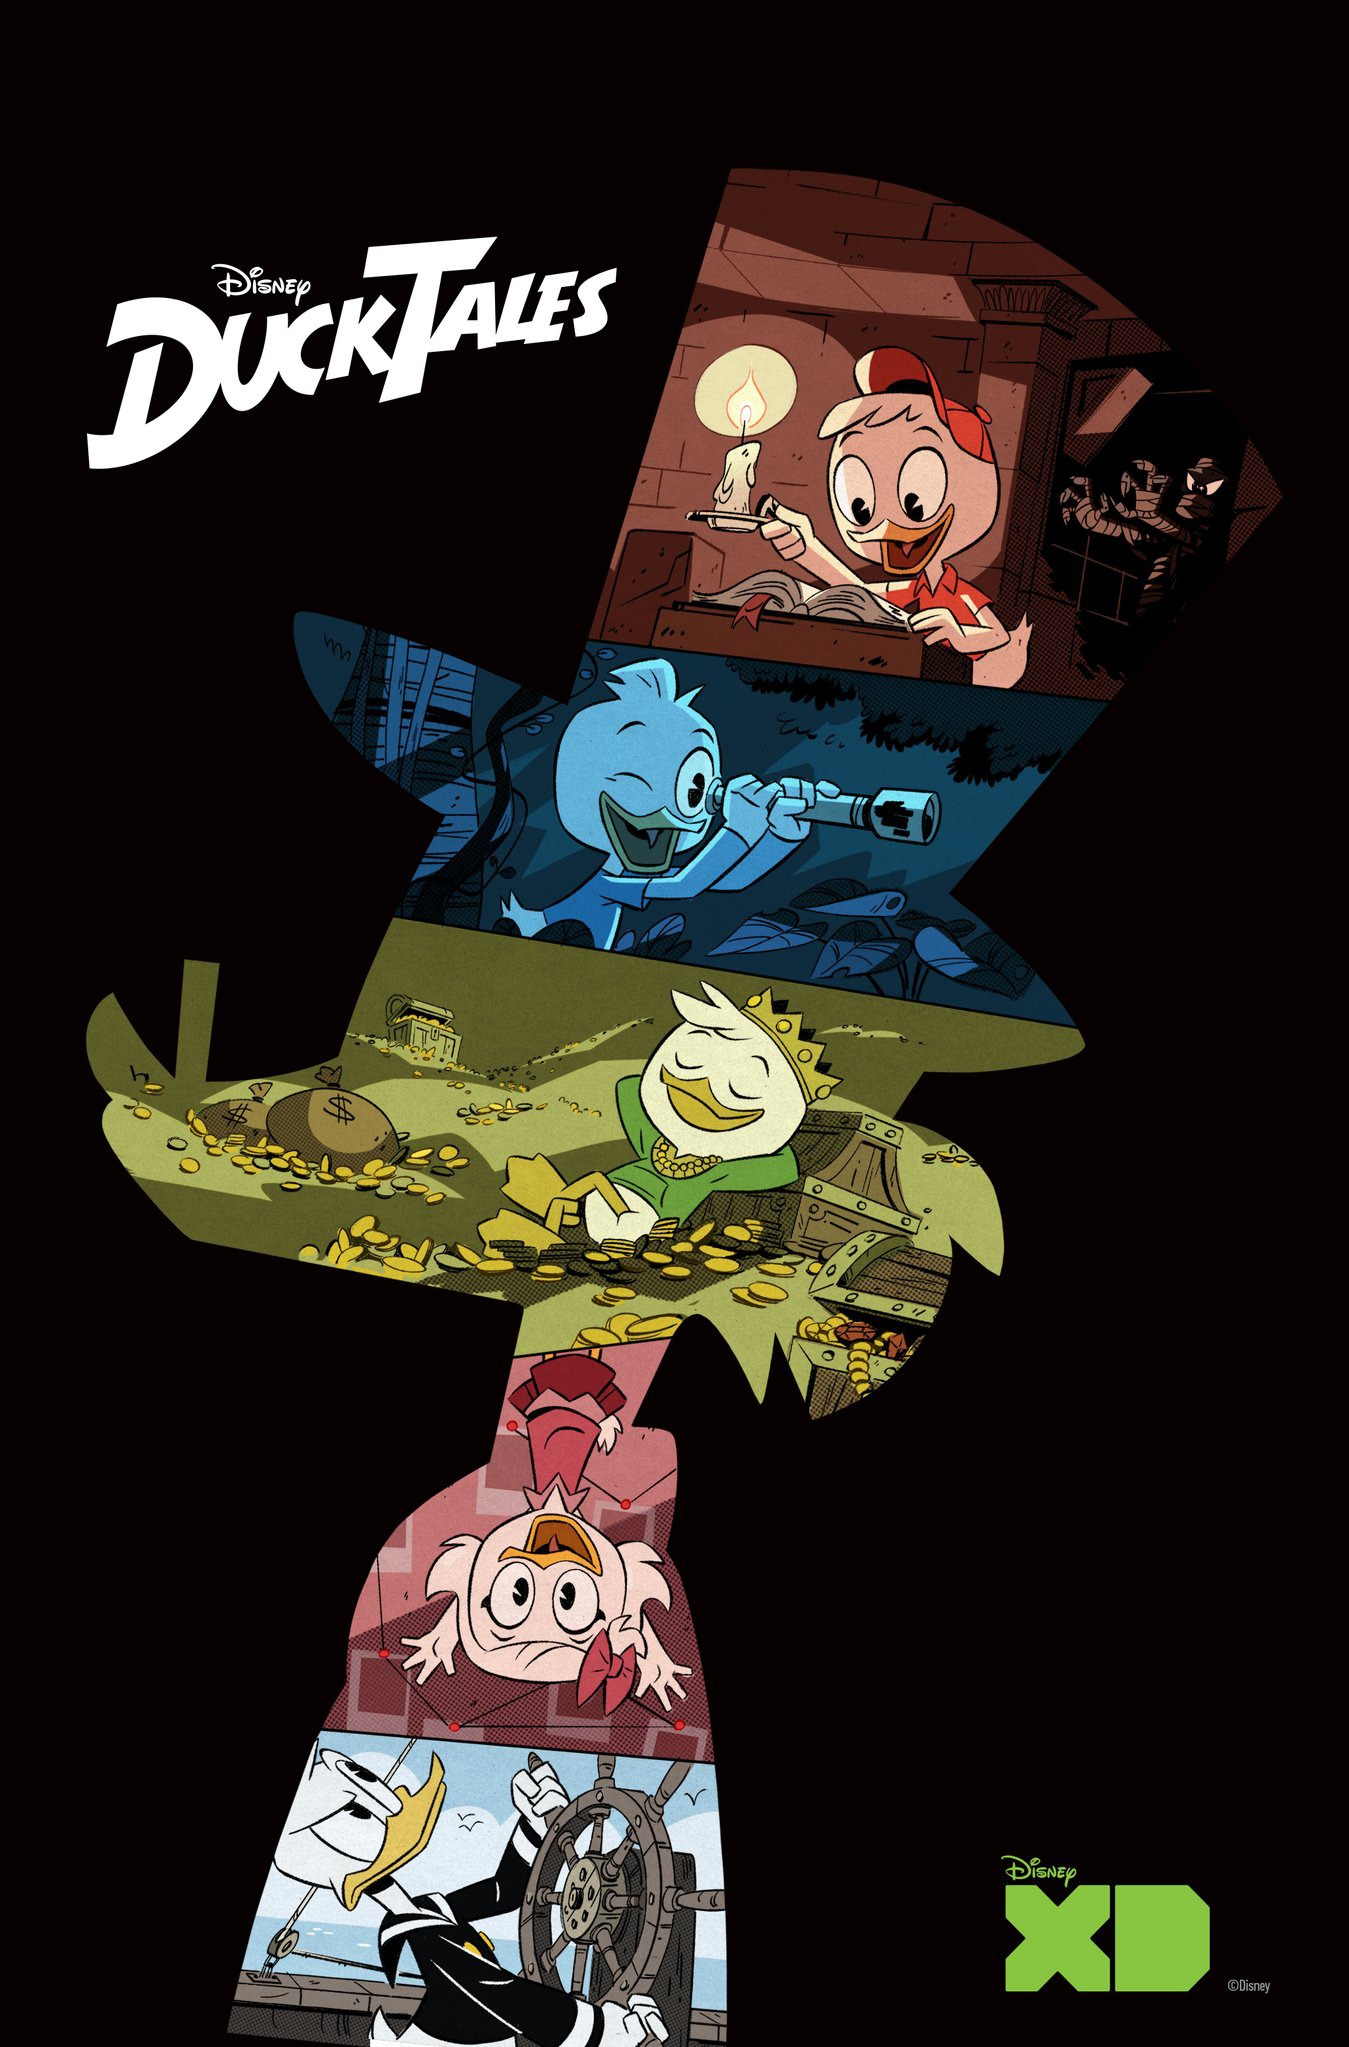 Image Ducktales 2017 Poster Png Disney Wiki Fandom